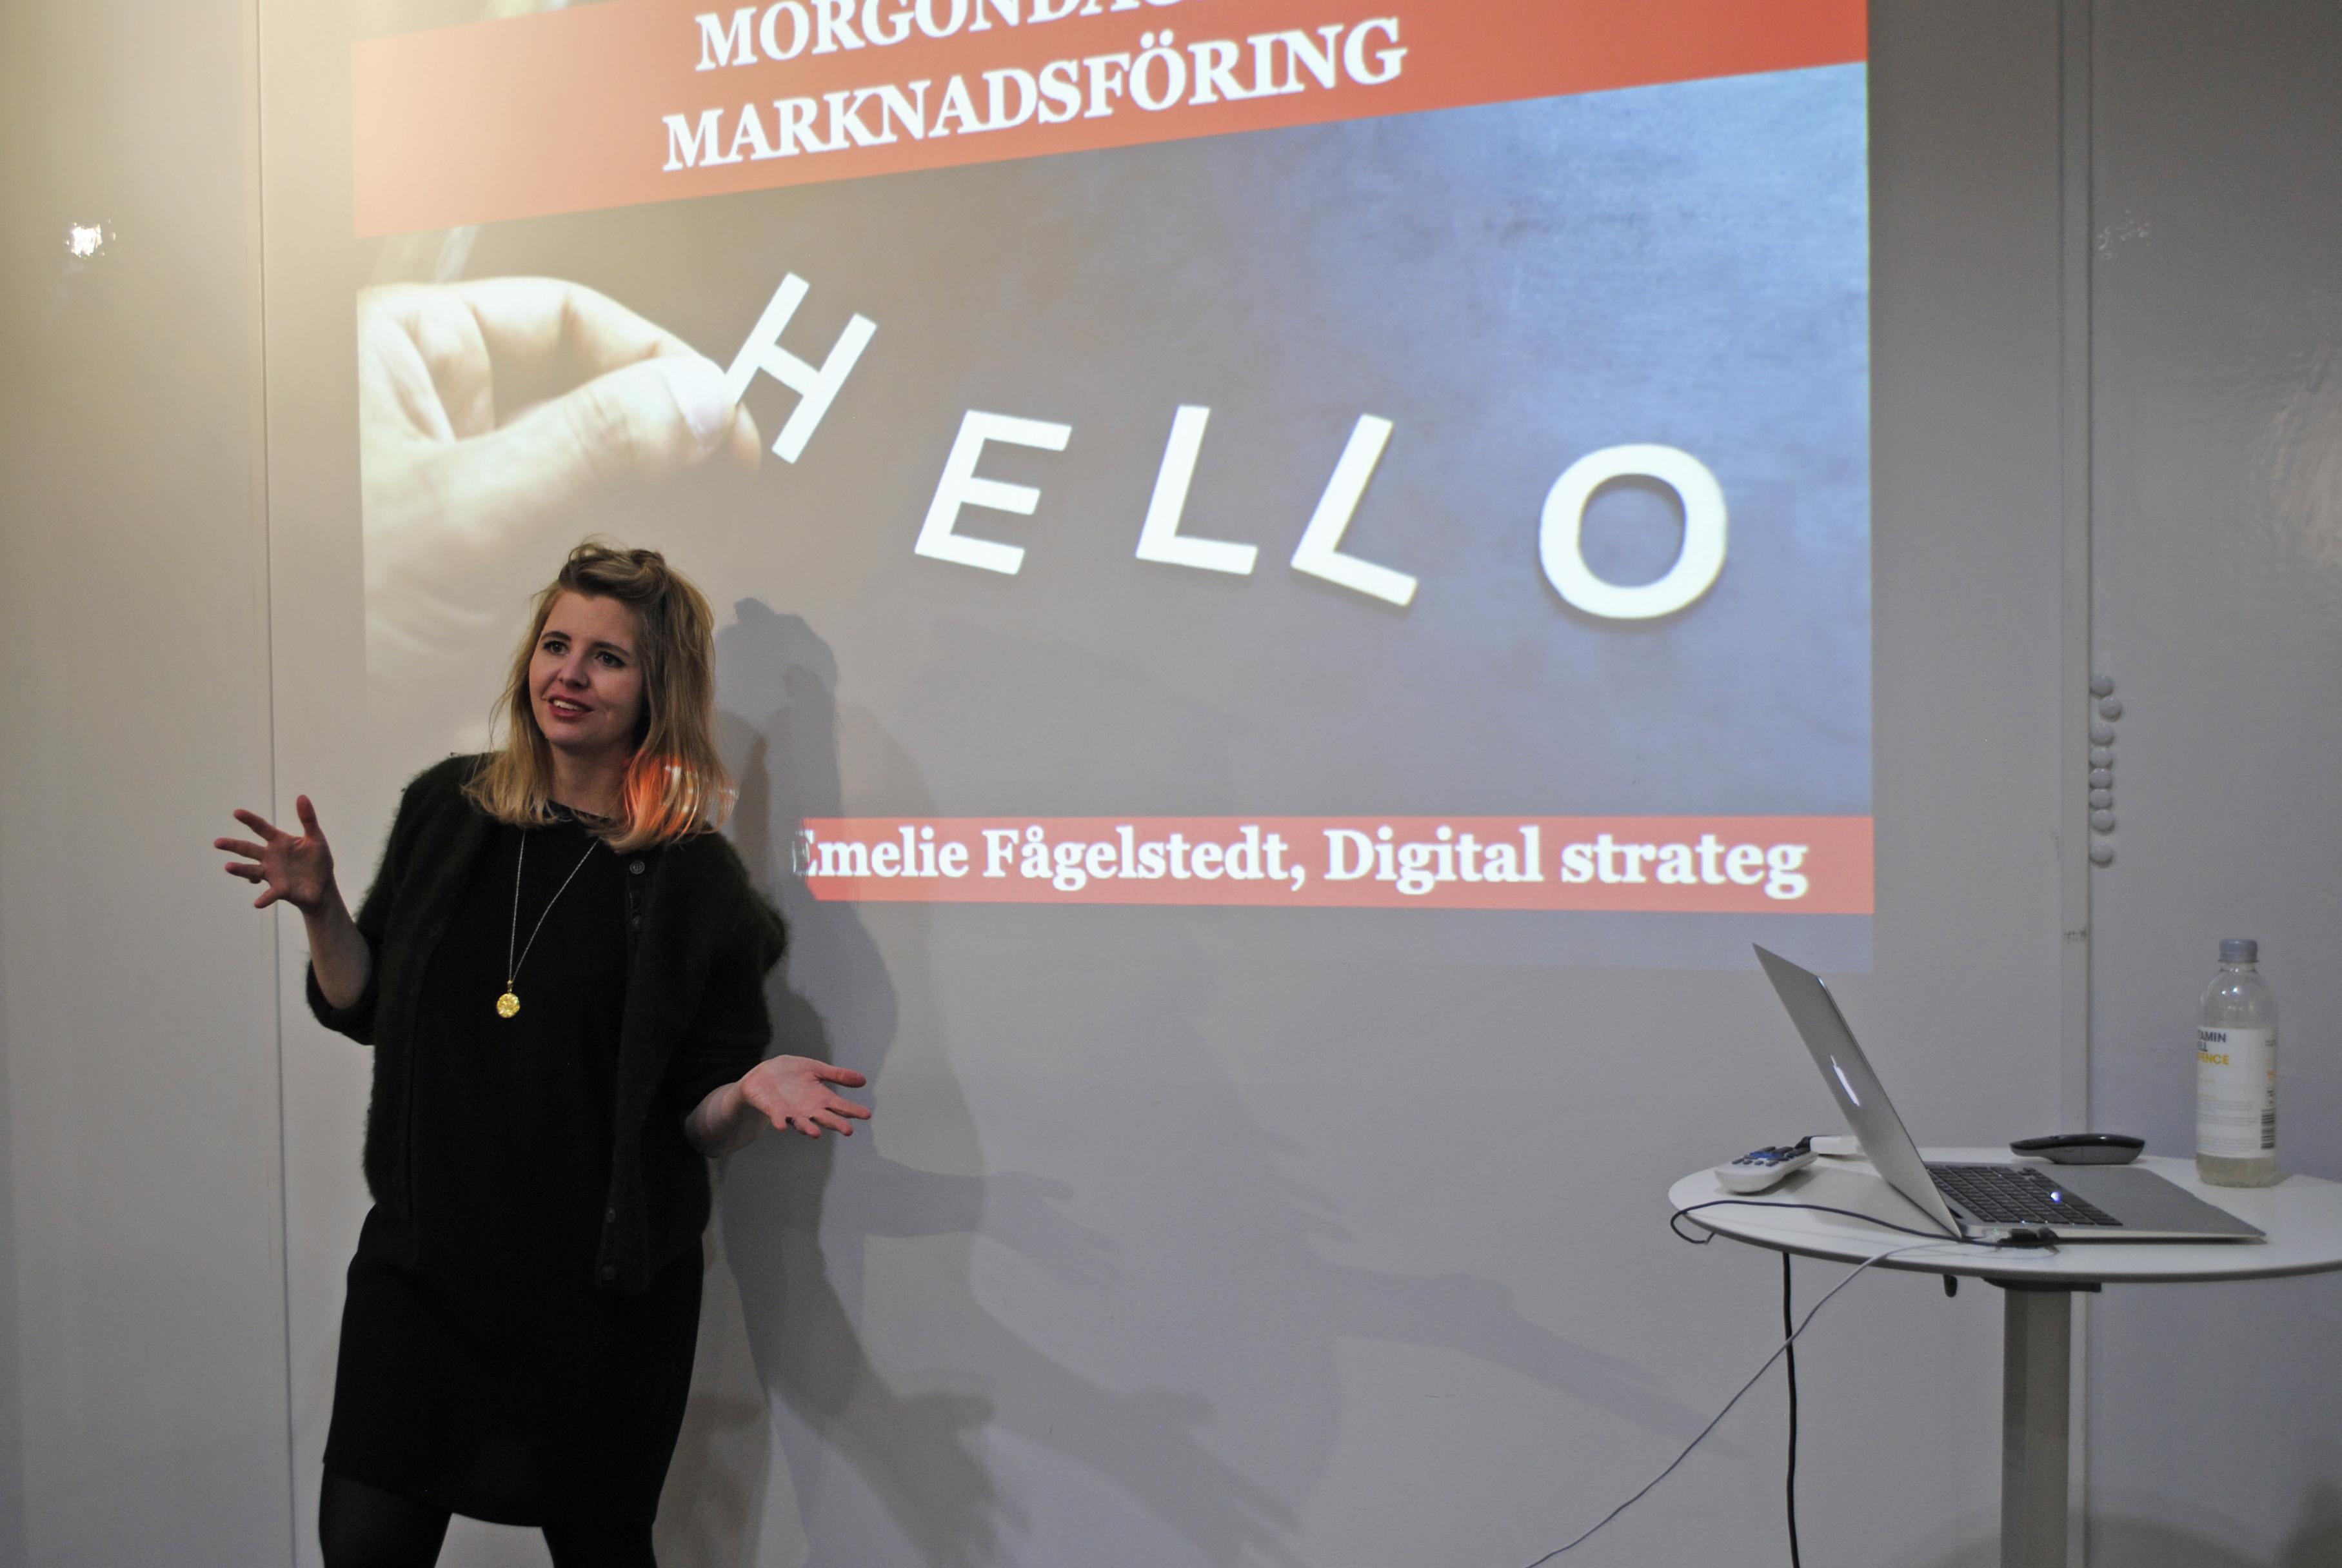 digitalmarknadsforing_emeliefagelstedt